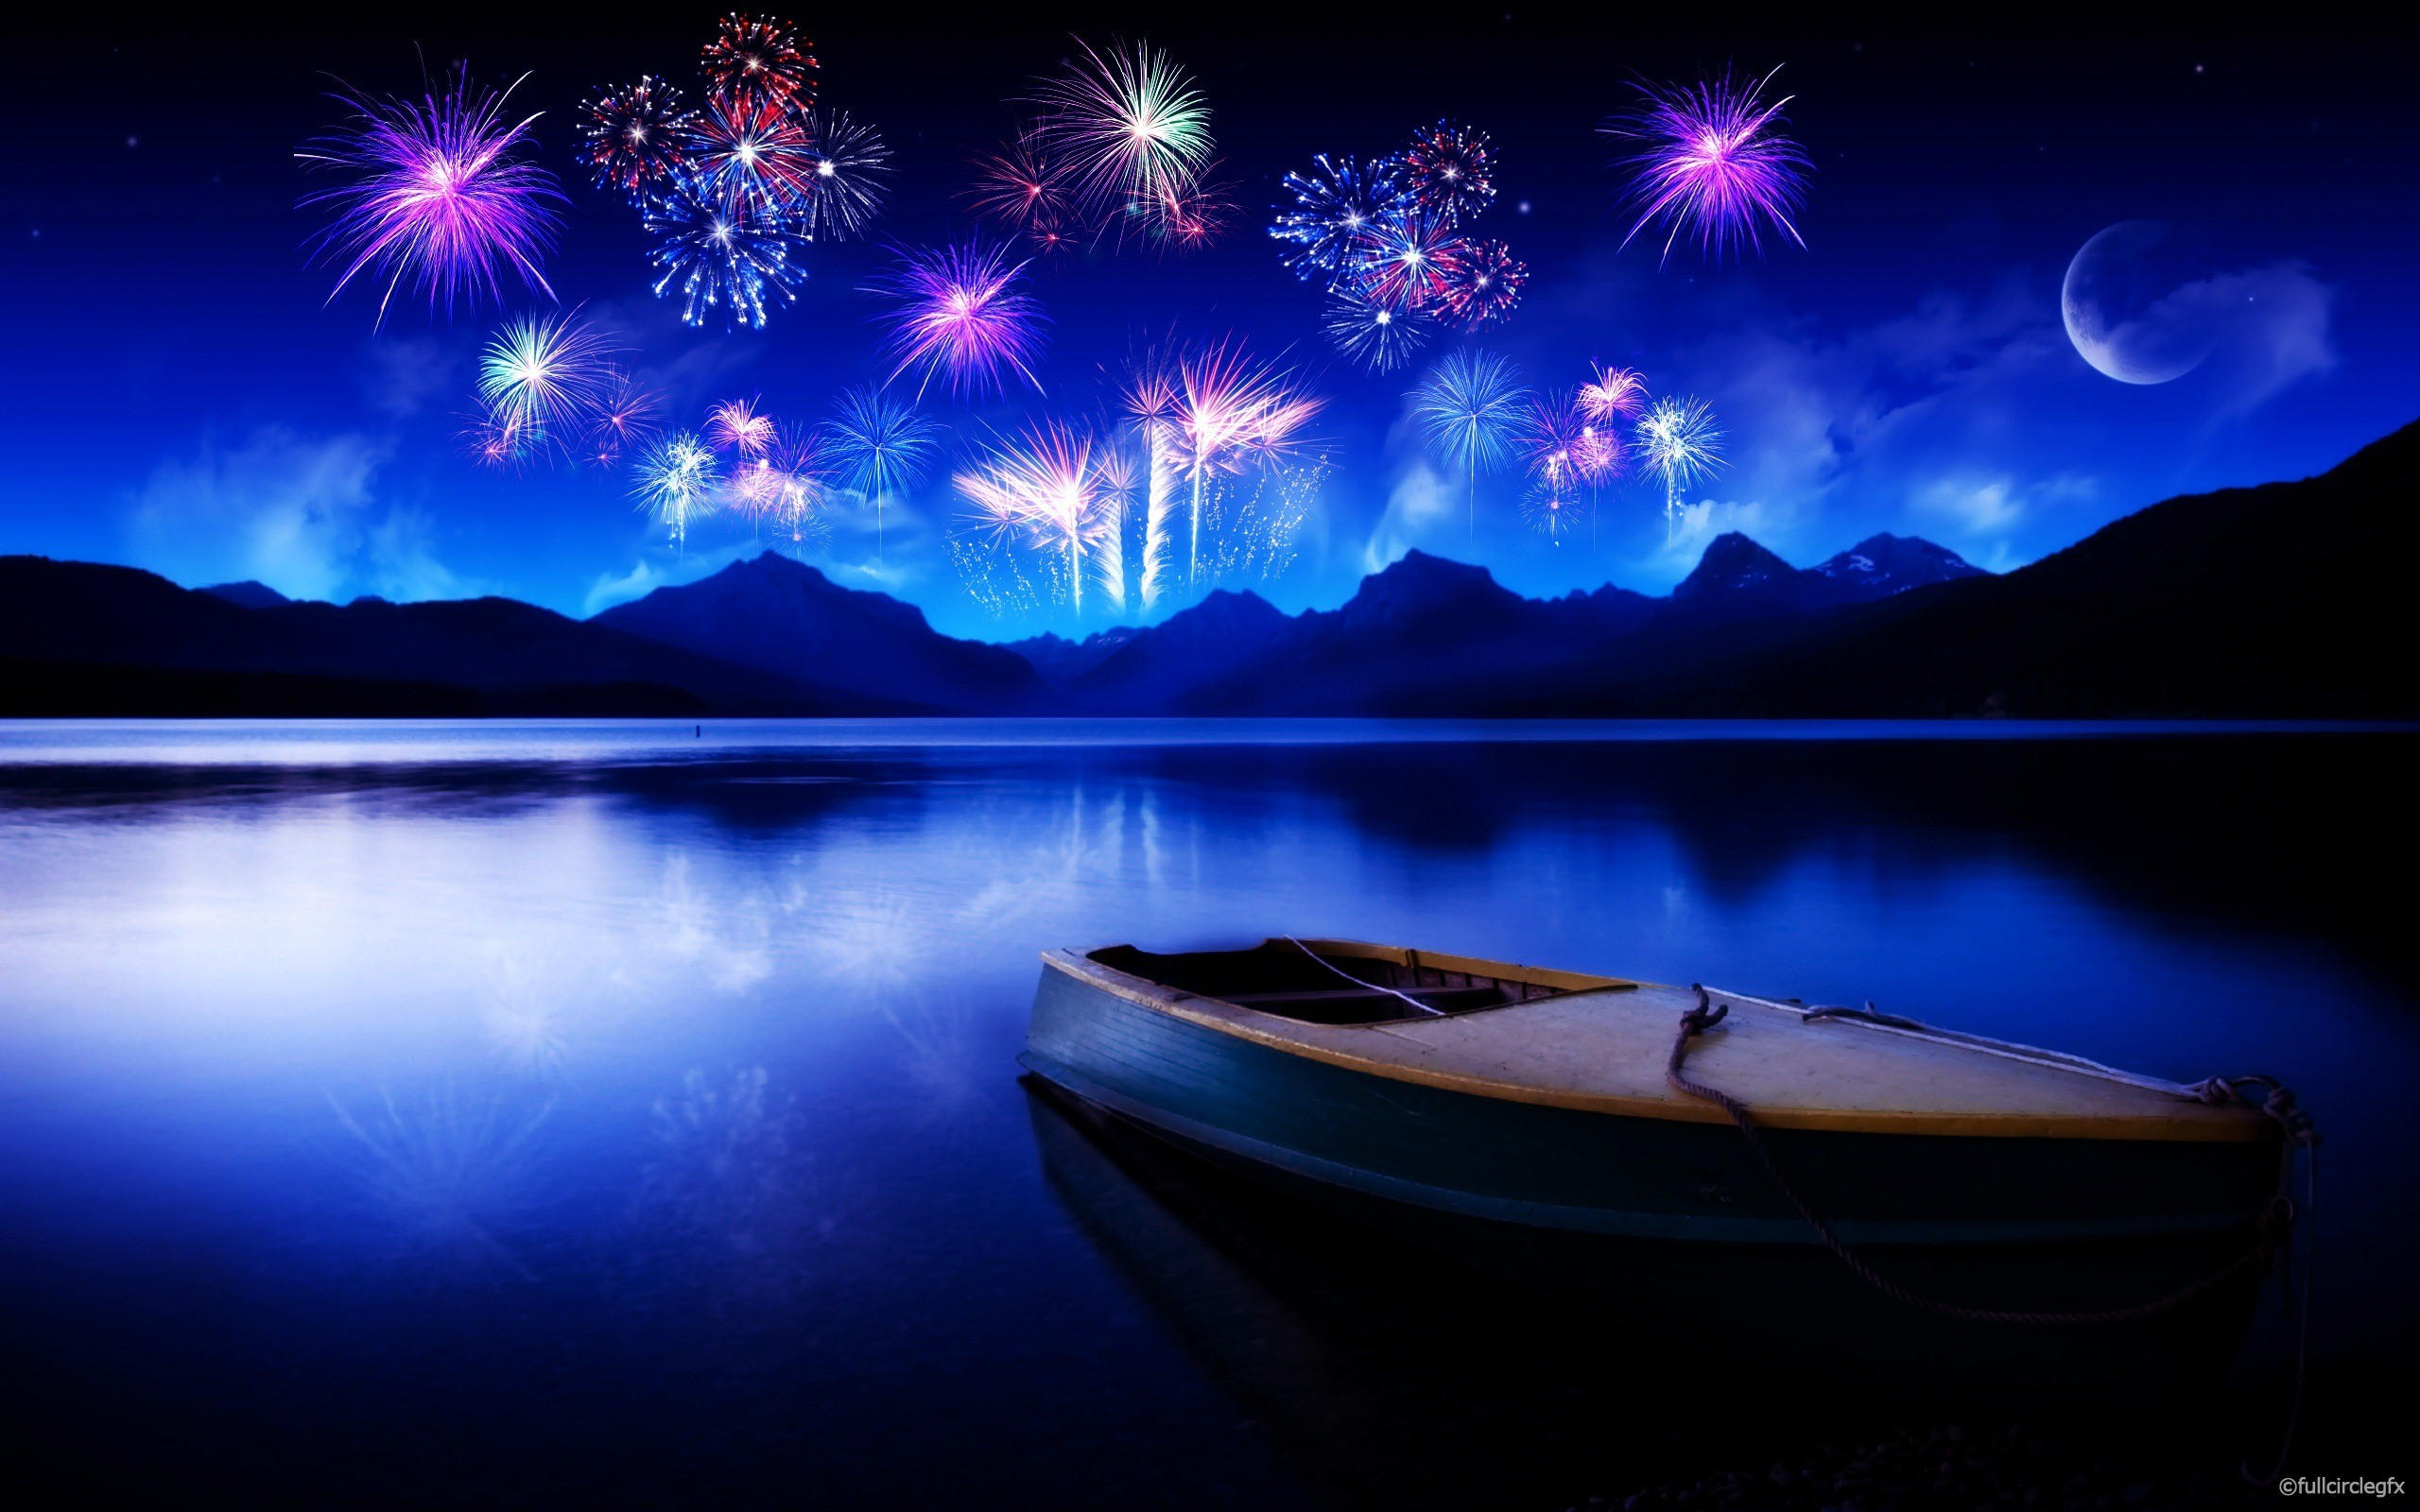 Best computer wallpapers 2012 – bestscreenwallpaper.com – fireworks to lake